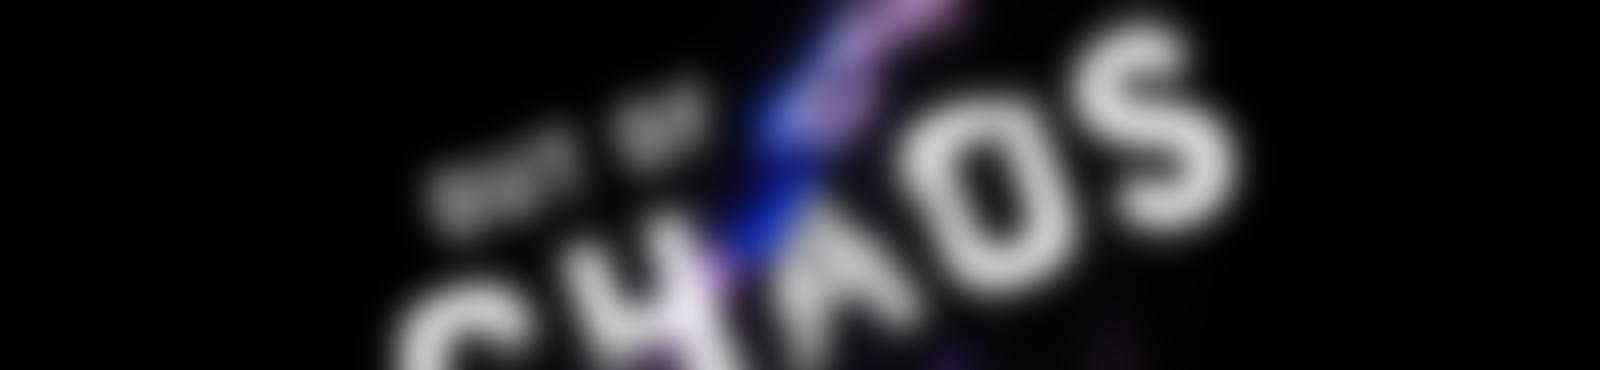 Blurred edce75e7 efe6 4a68 bb81 787c908f65fd